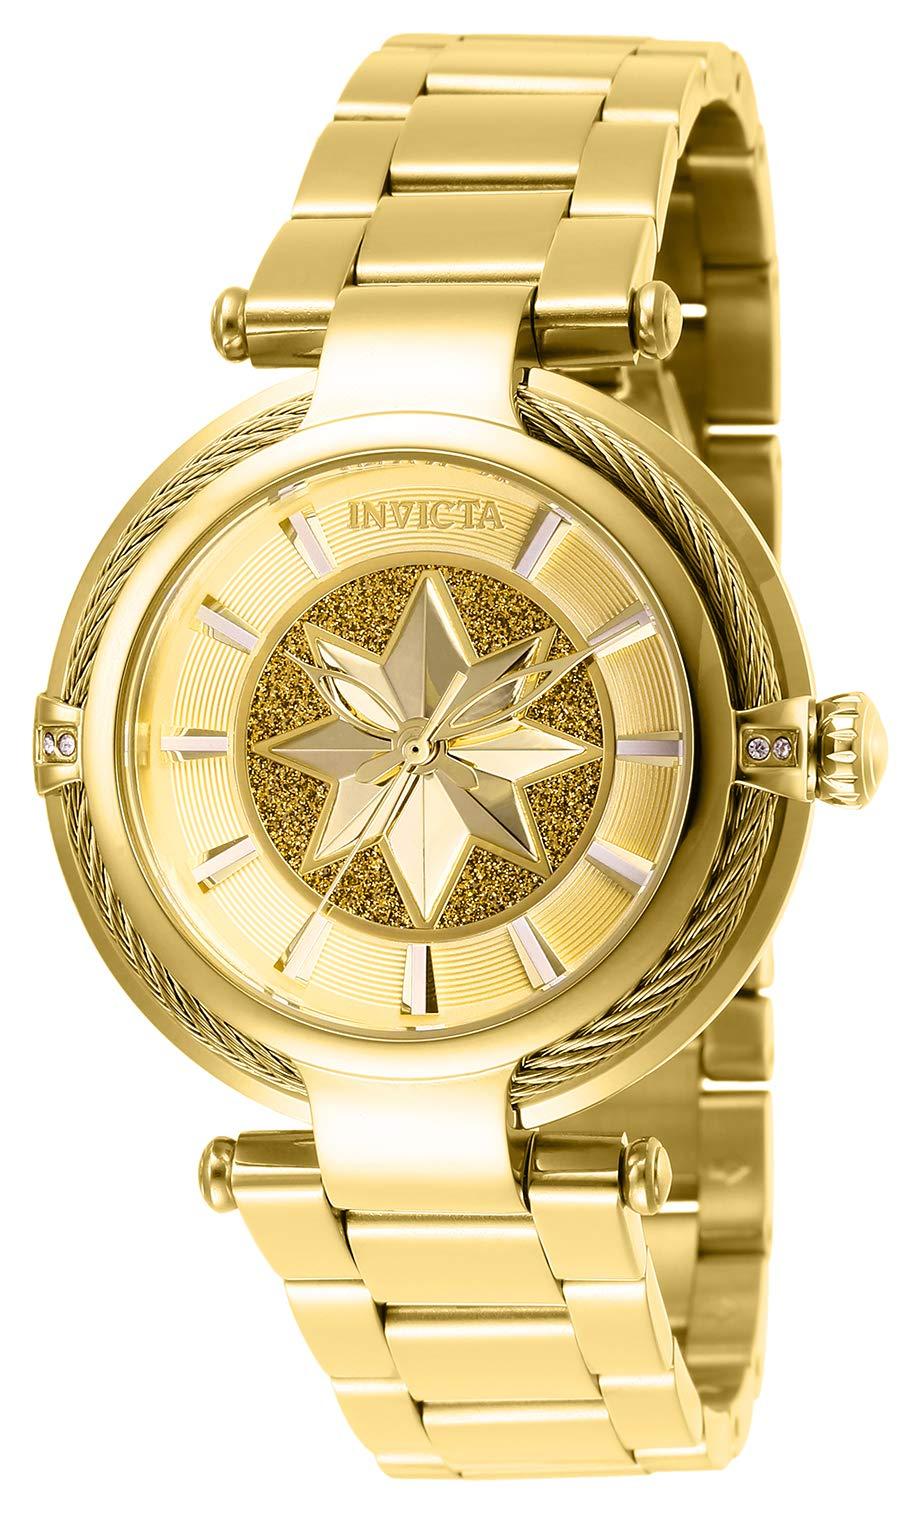 ویکالا · خرید  اصل اورجینال · خرید از آمازون · Invicta Women's Captain Marvel Analog Quartz Watch with Stainless Steel Strap, Gold, 20 (Model: 28833) wekala · ویکالا